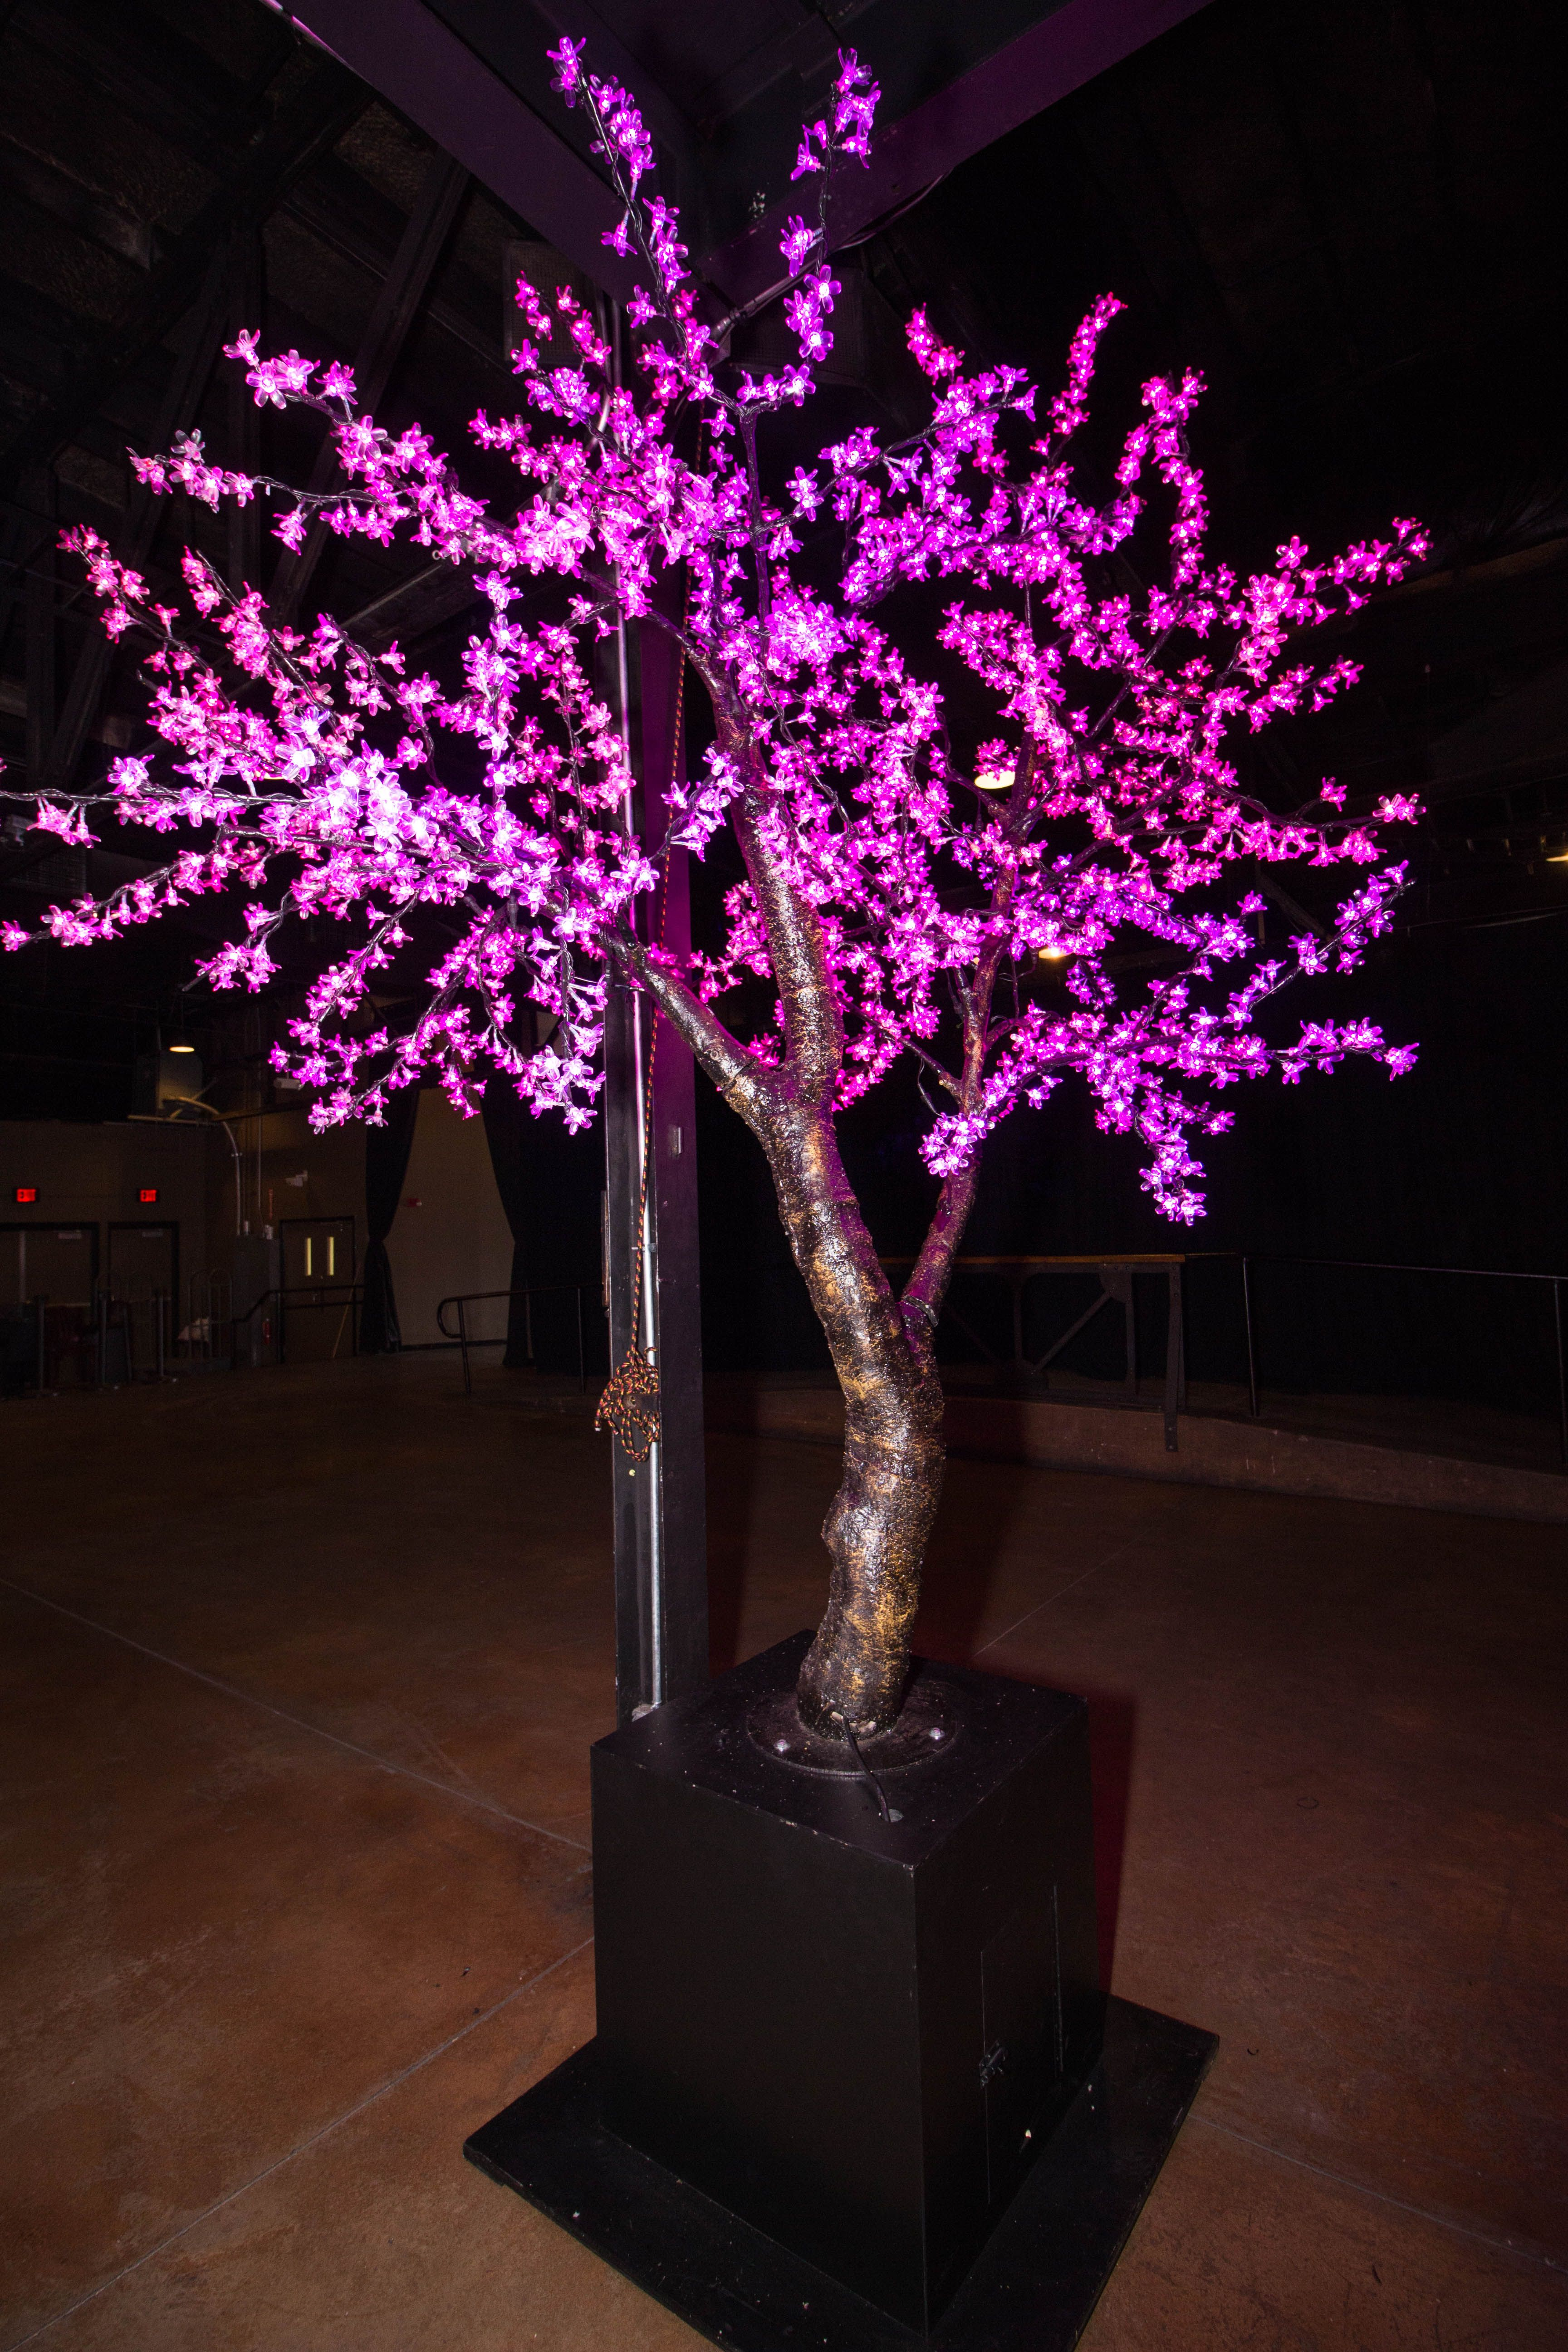 Led Cherry Blossom Tree Shag Carpet Prop Rentals Dallas Tx Cherry Blossom Tree Blossom Cherry Blossom